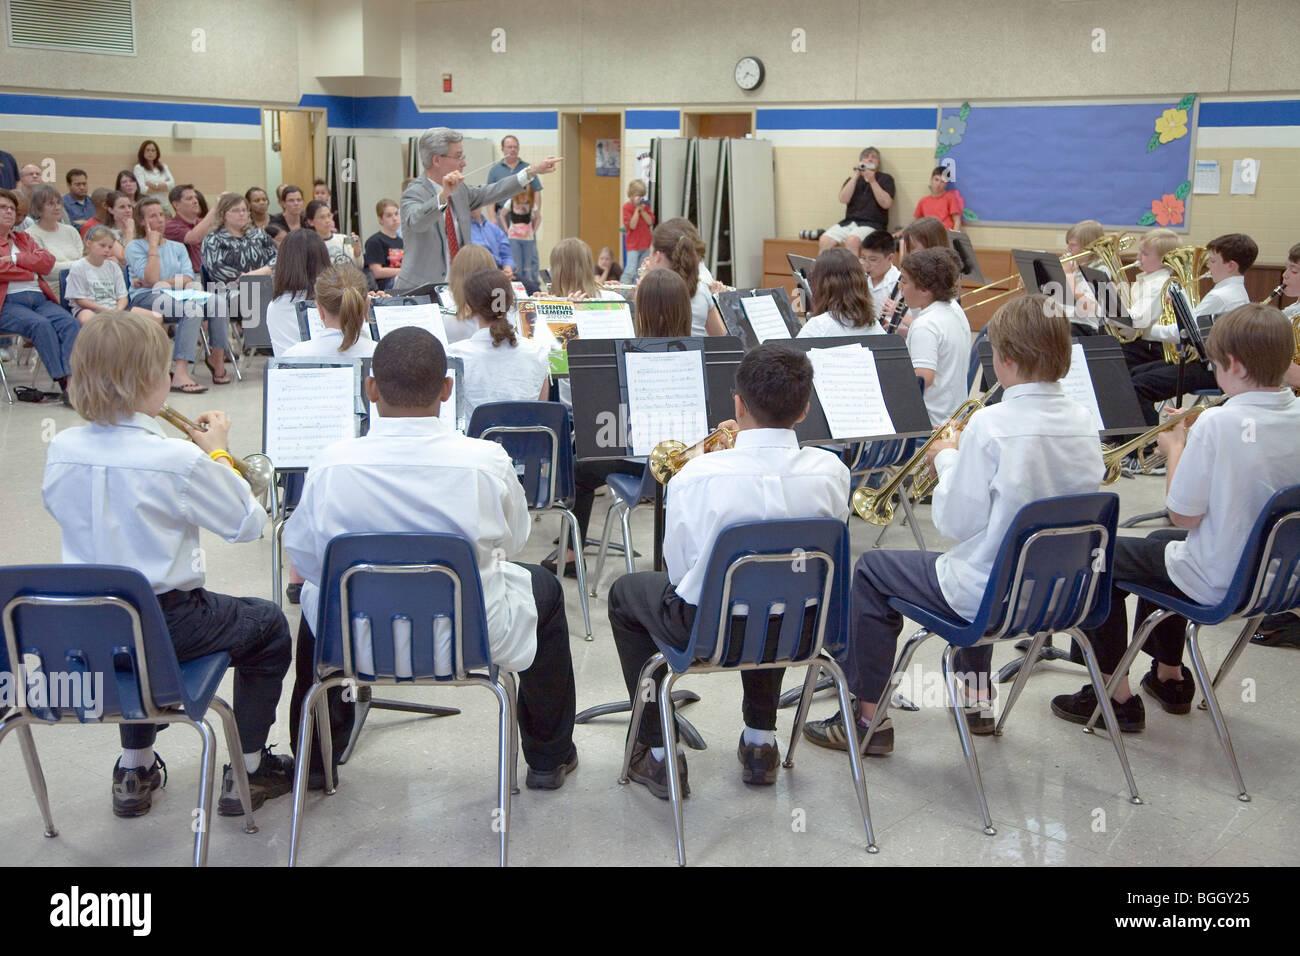 5th grade band recital at Ravensworth Elementary, Fairfax County, Springfield, Virginia - Stock Image